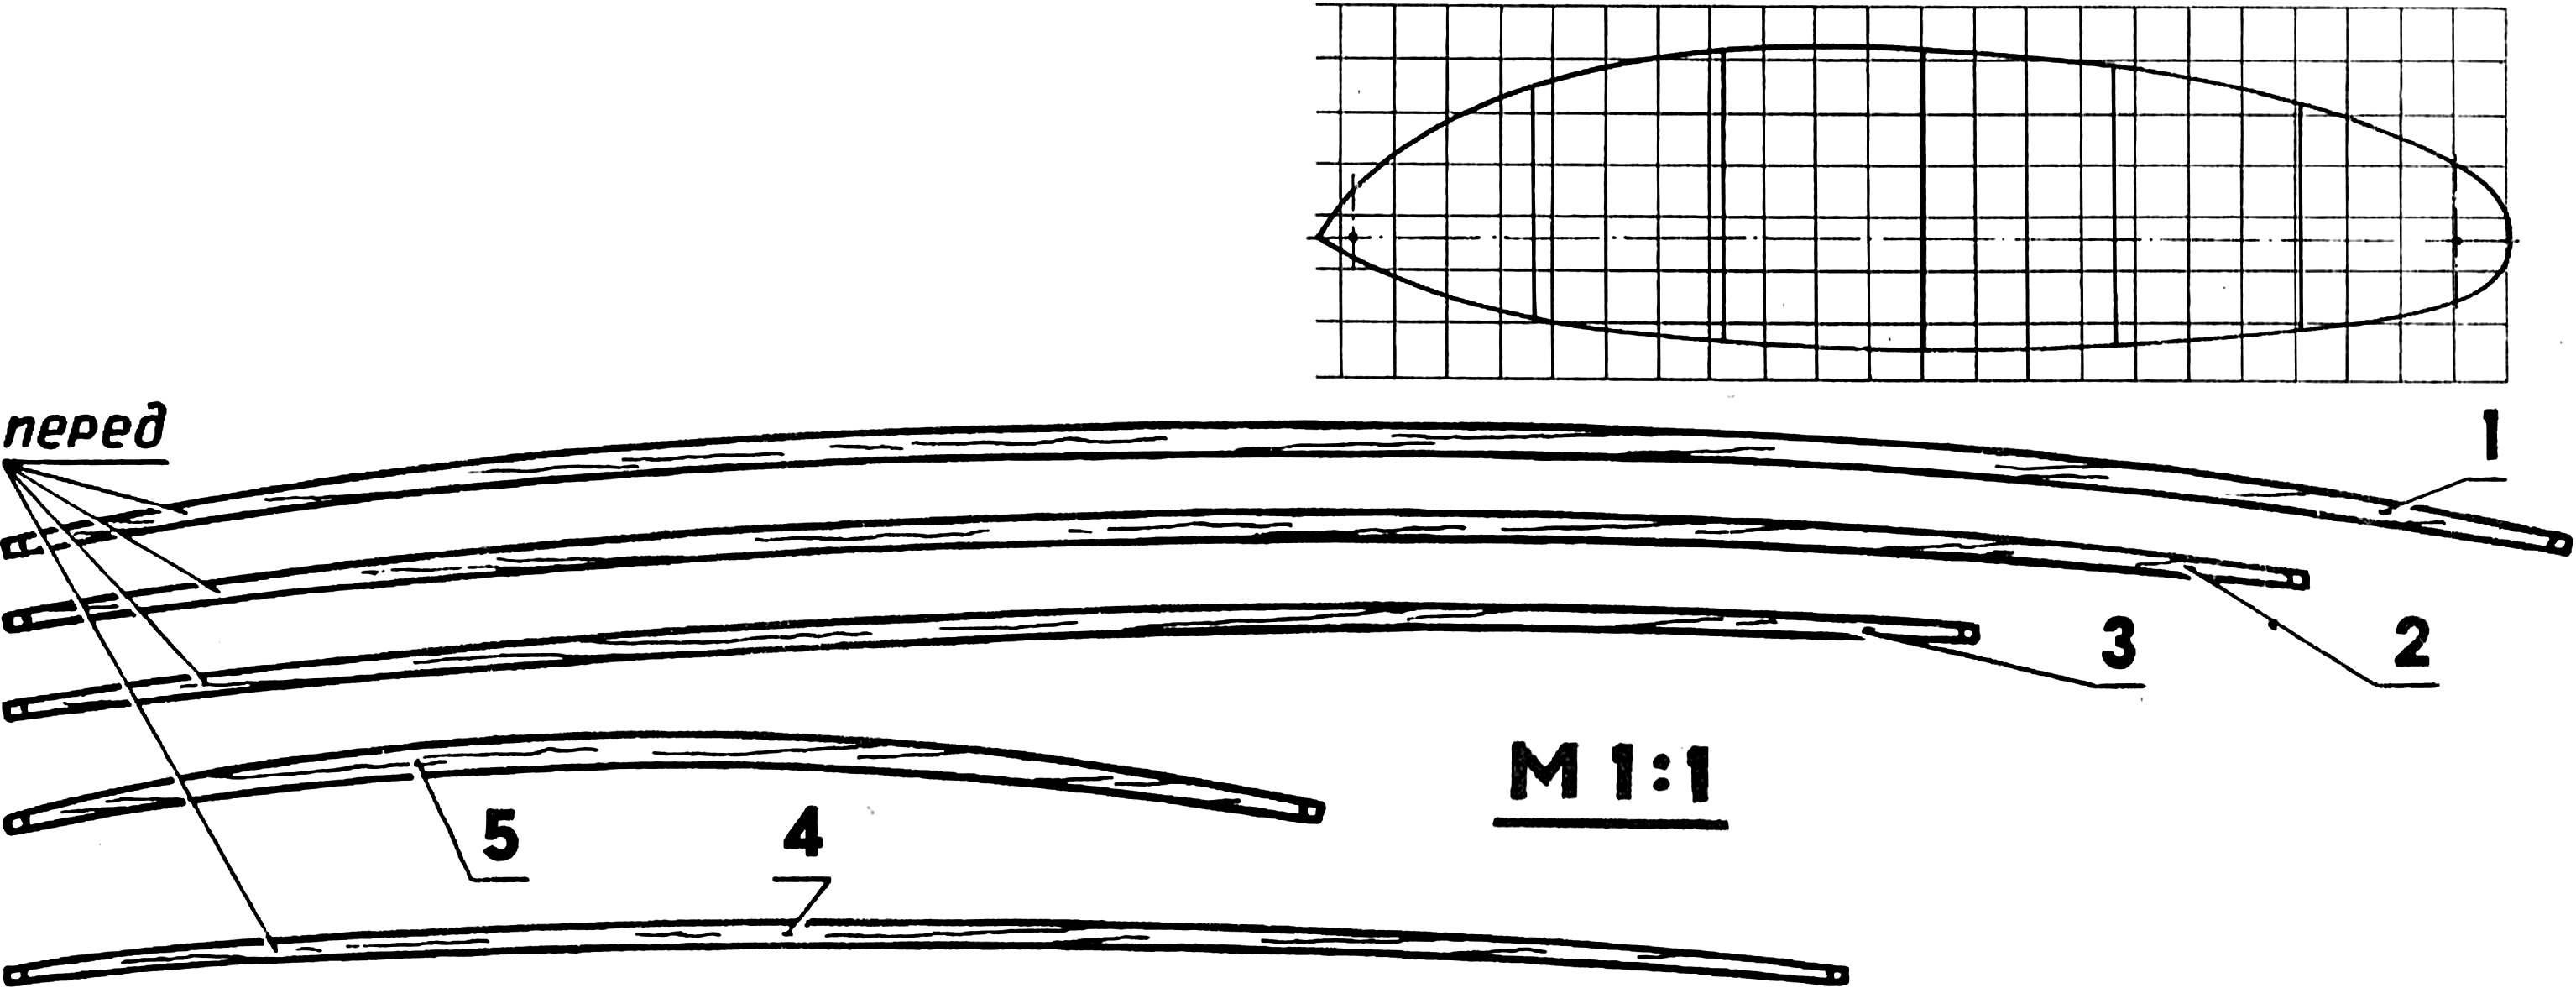 Fig. 2. Profiles.